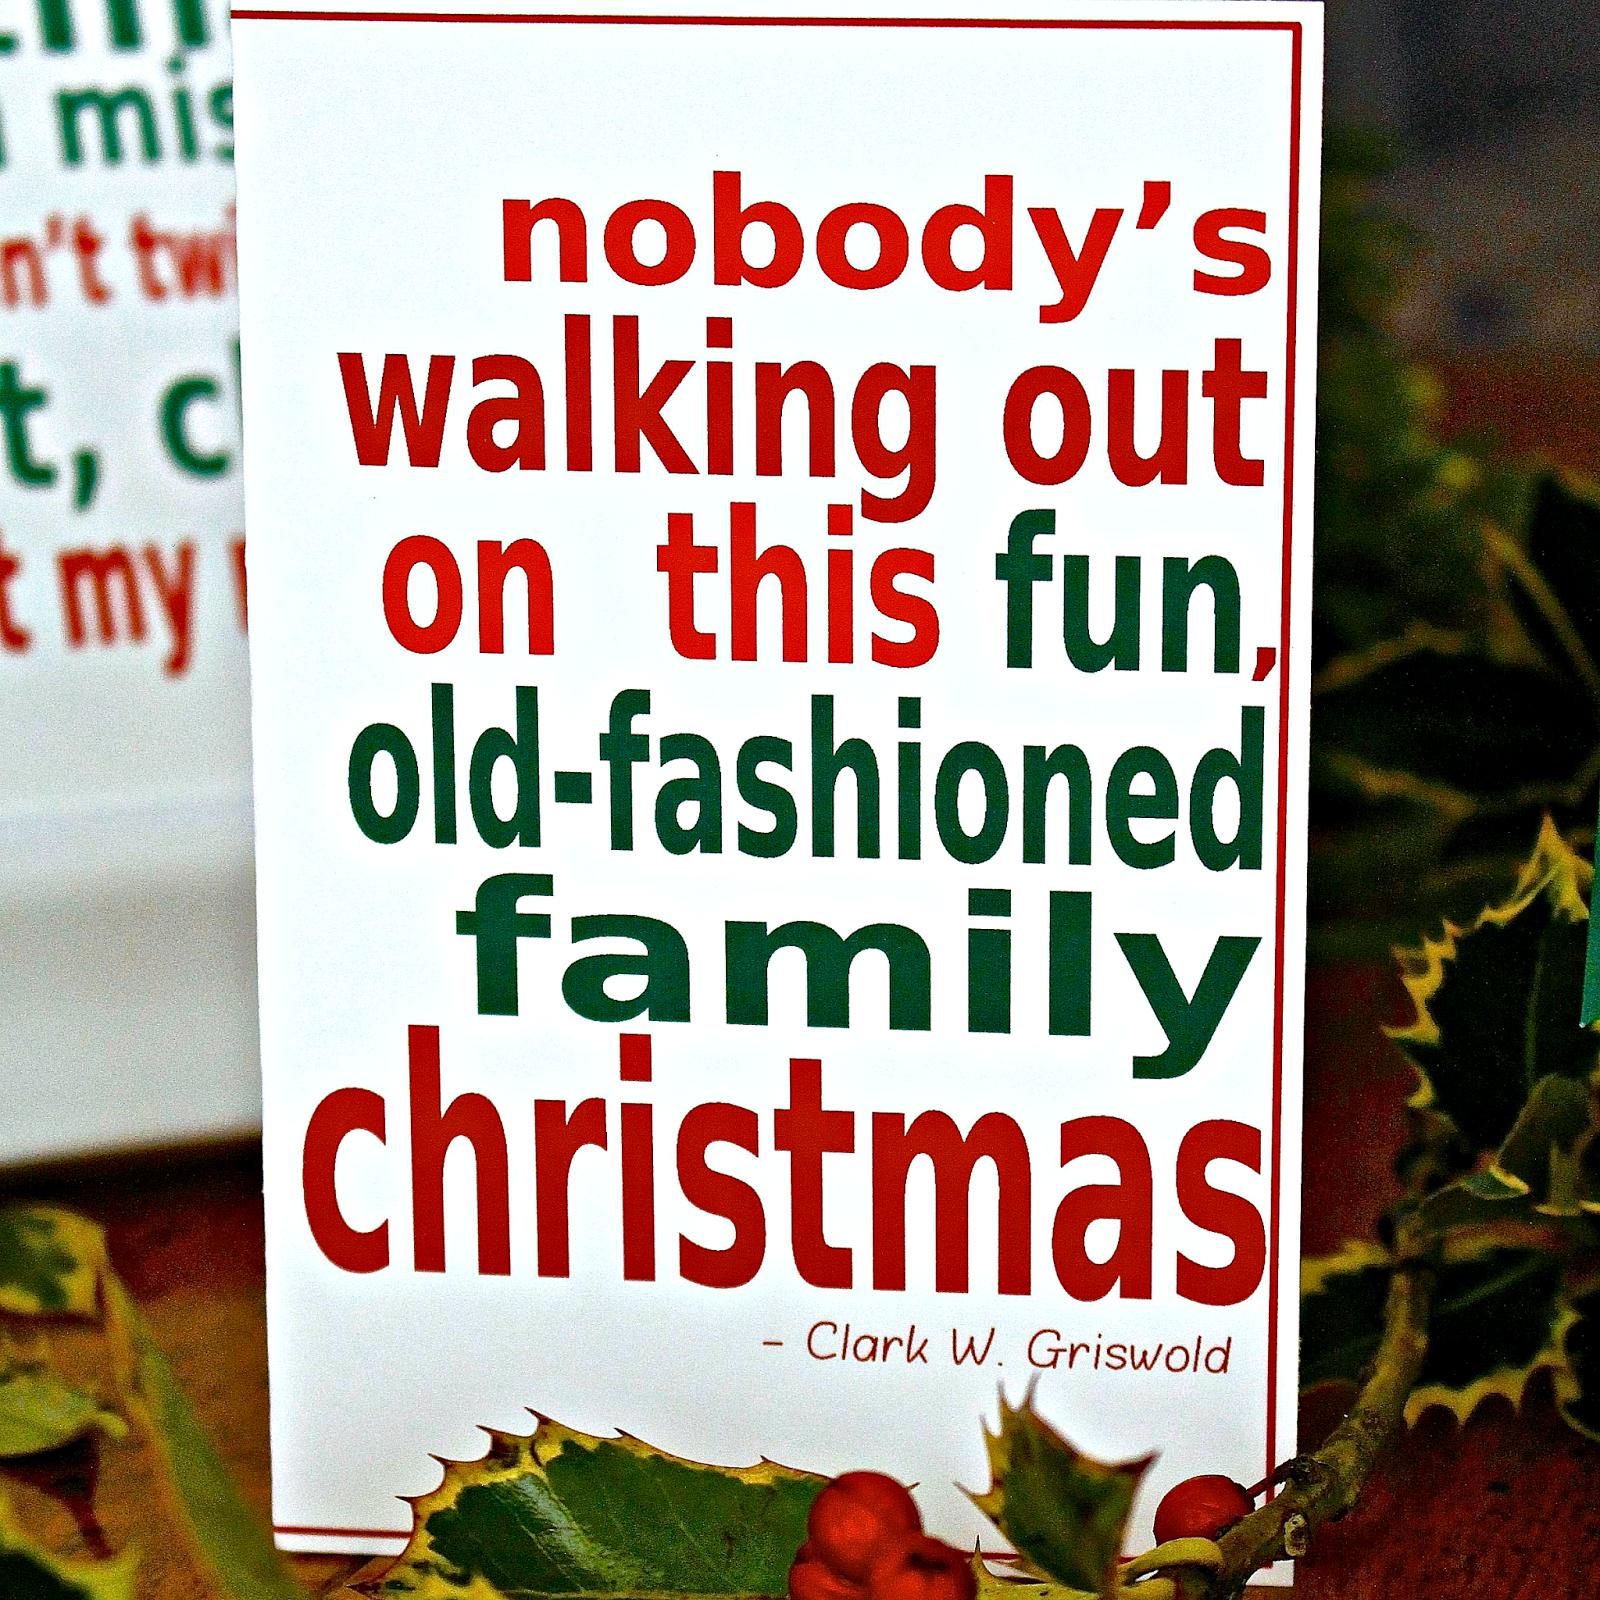 Christmas Vacation Santa Quotes: National Lampoons Christmas Vacation Printable Movie Quote